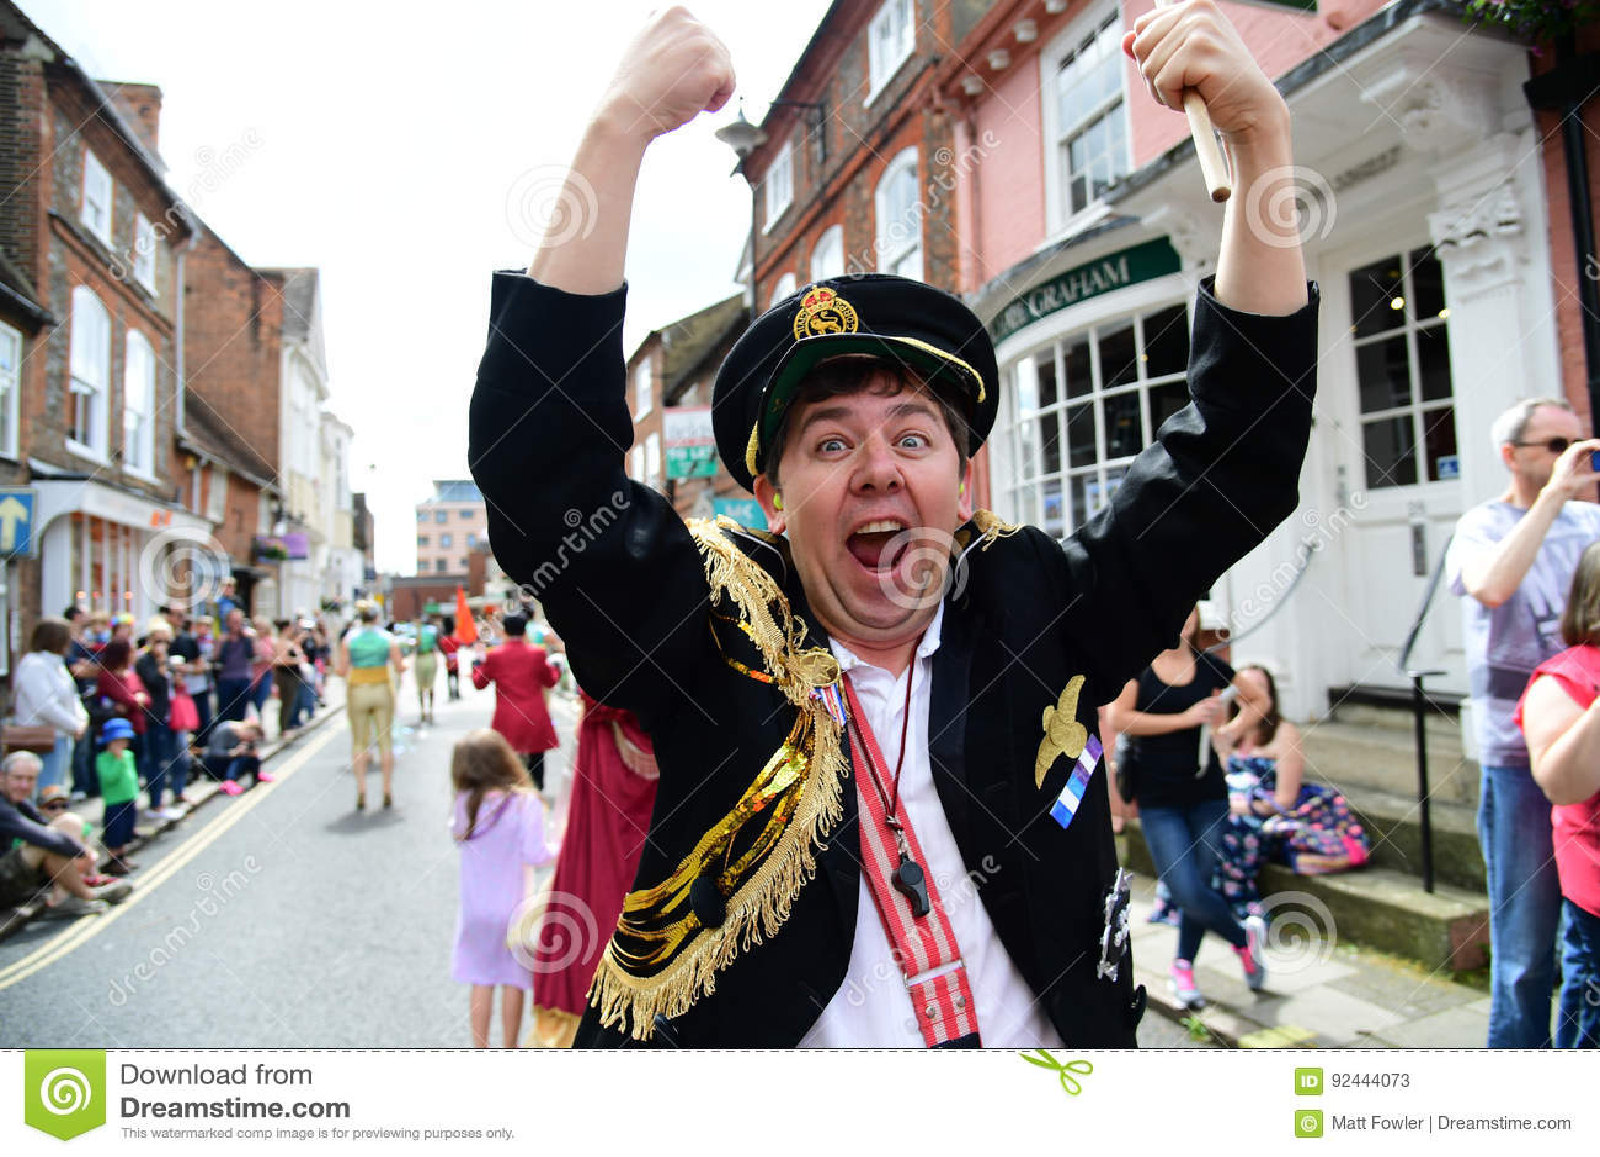 Roald Dahl Carnival Aylesbury, Buckinghamshire